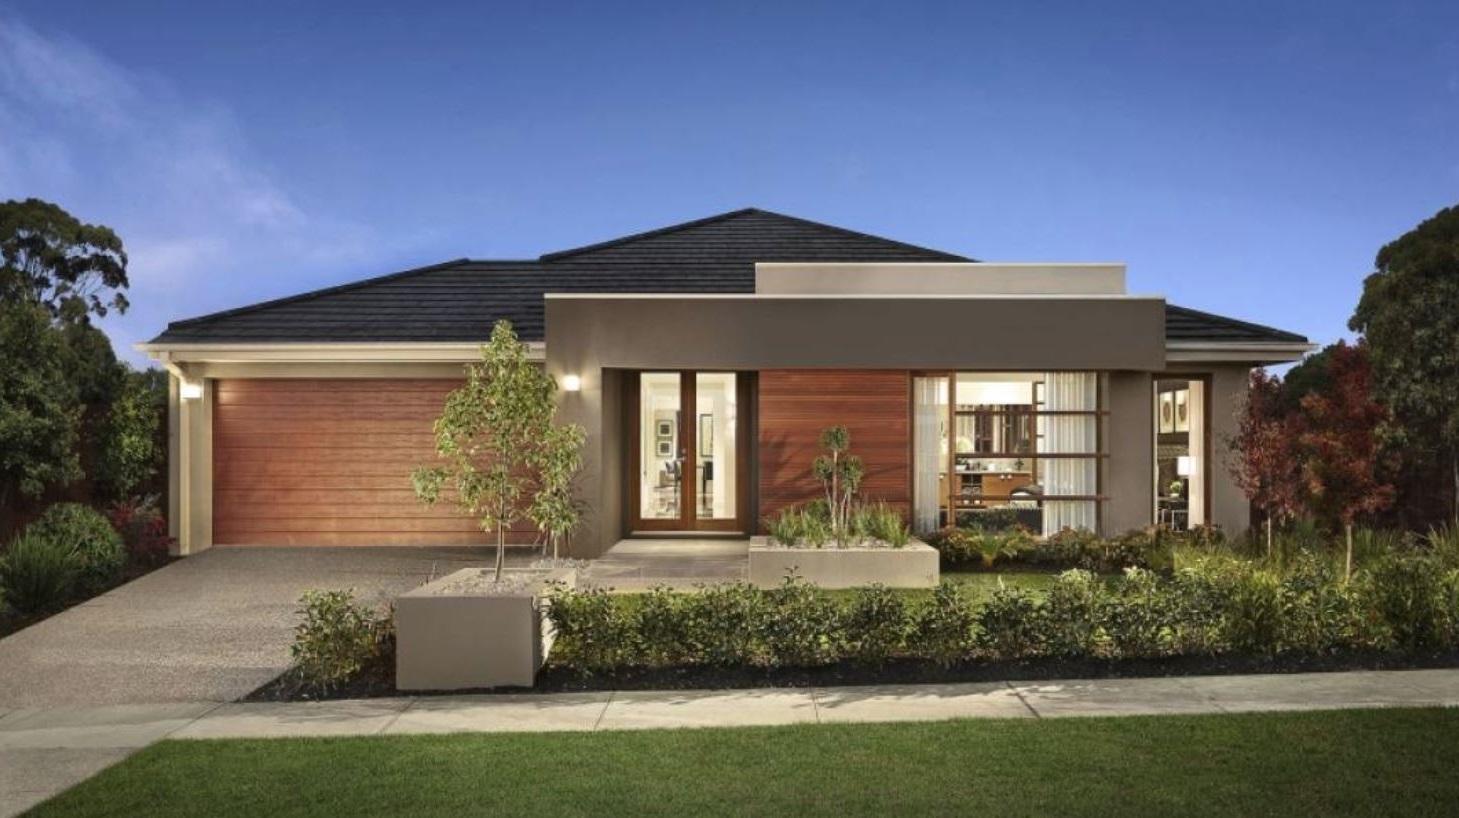 Fachadas de casas de 1 piso for Diseno de jardines frentes de casas